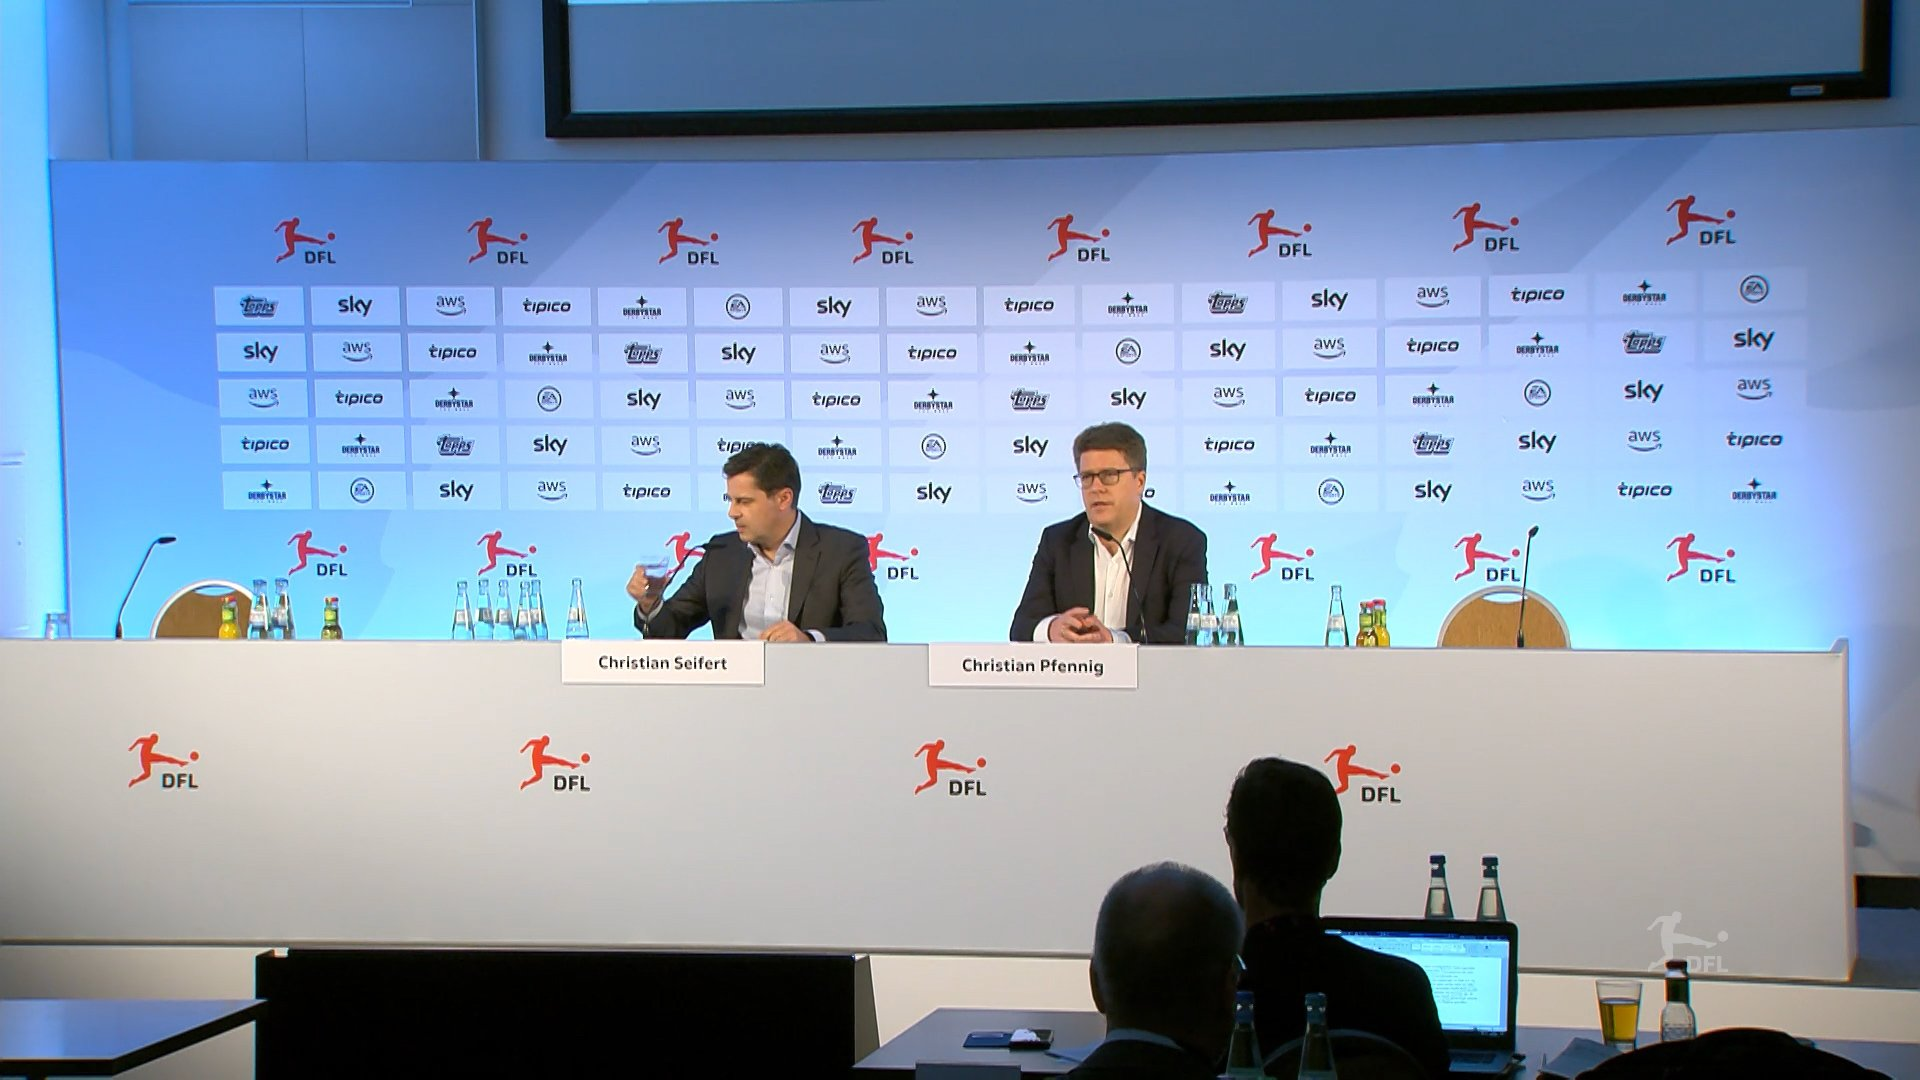 Dfl Pressekonferenz